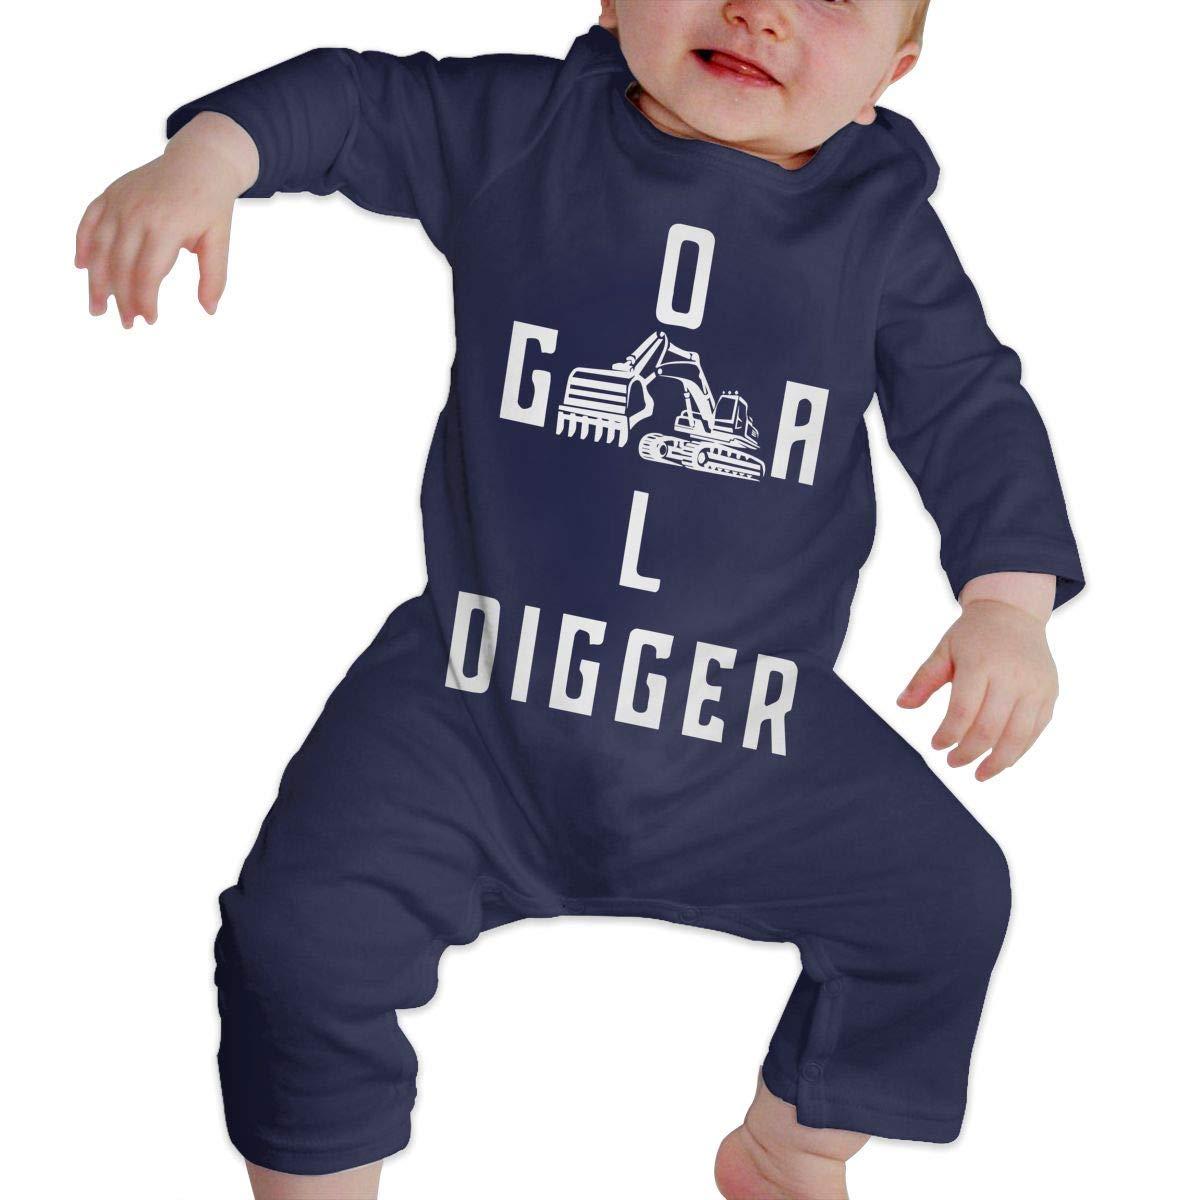 TYLER DEAN Newborn Baby Jumpsuit Goal Digger Infant Long Sleeve Romper Jumpsuit